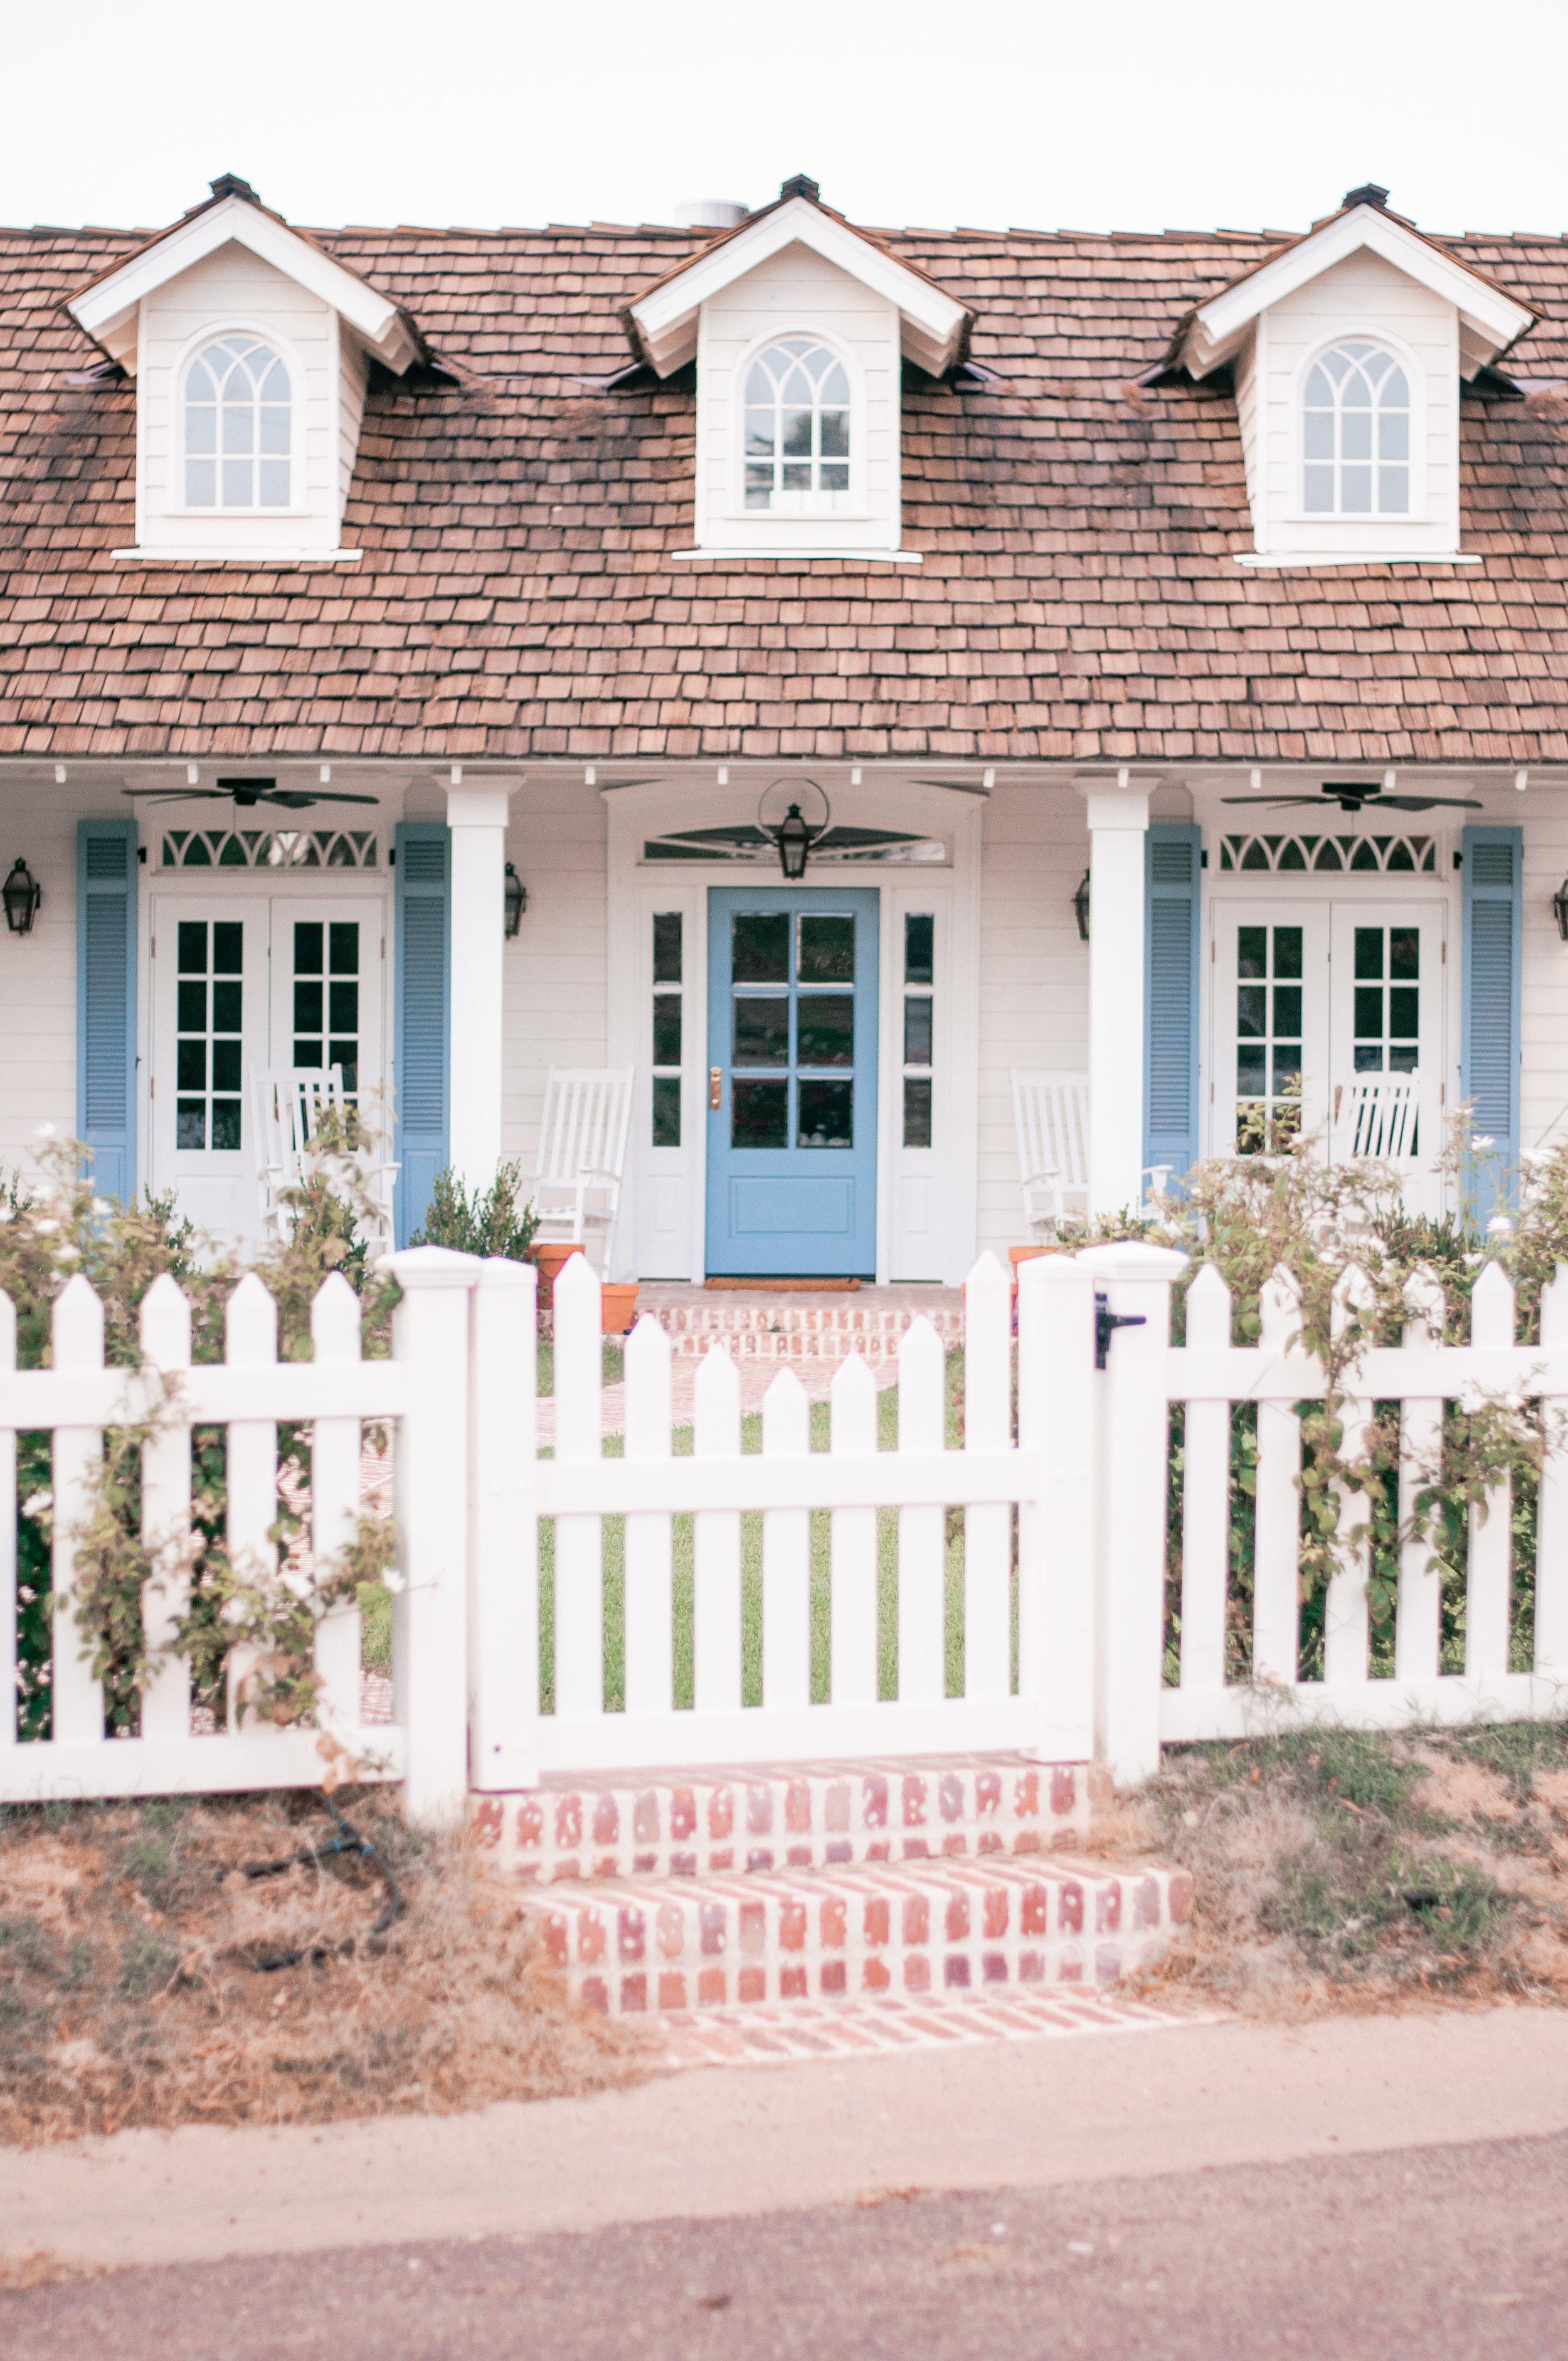 Cute Homes in Arcadia, Phoenix, Arizona